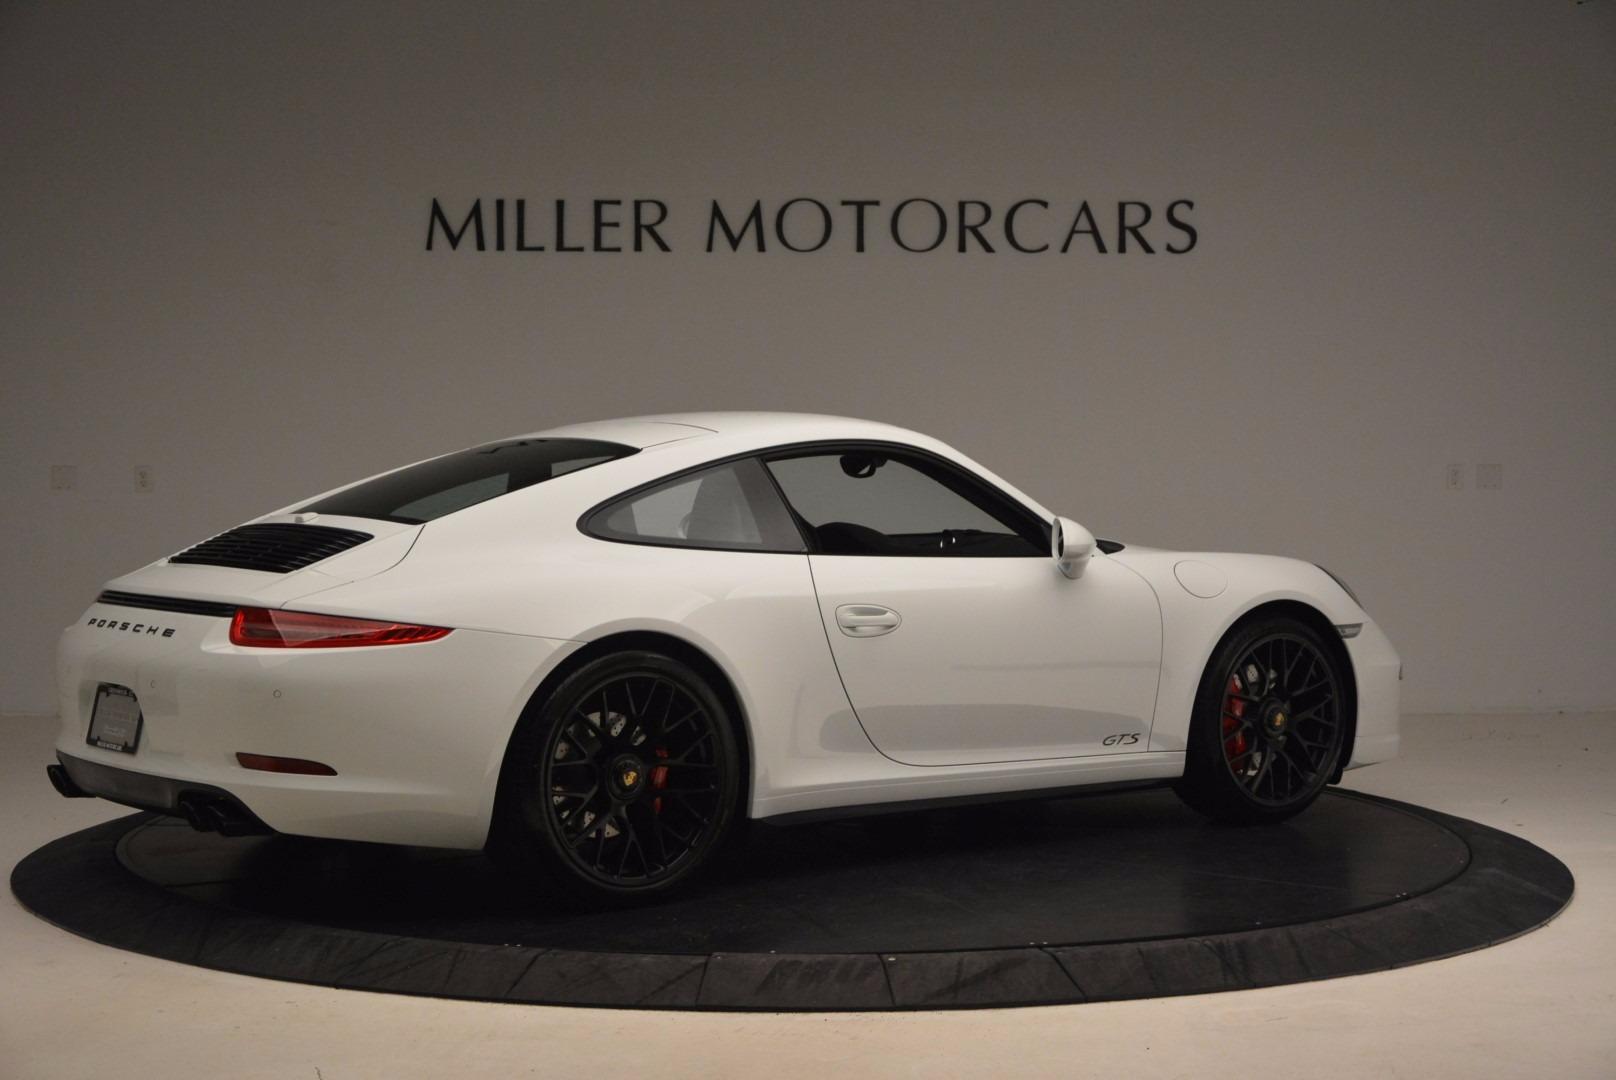 Used 2015 Porsche 911 Carrera GTS For Sale In Greenwich, CT 1444_p8